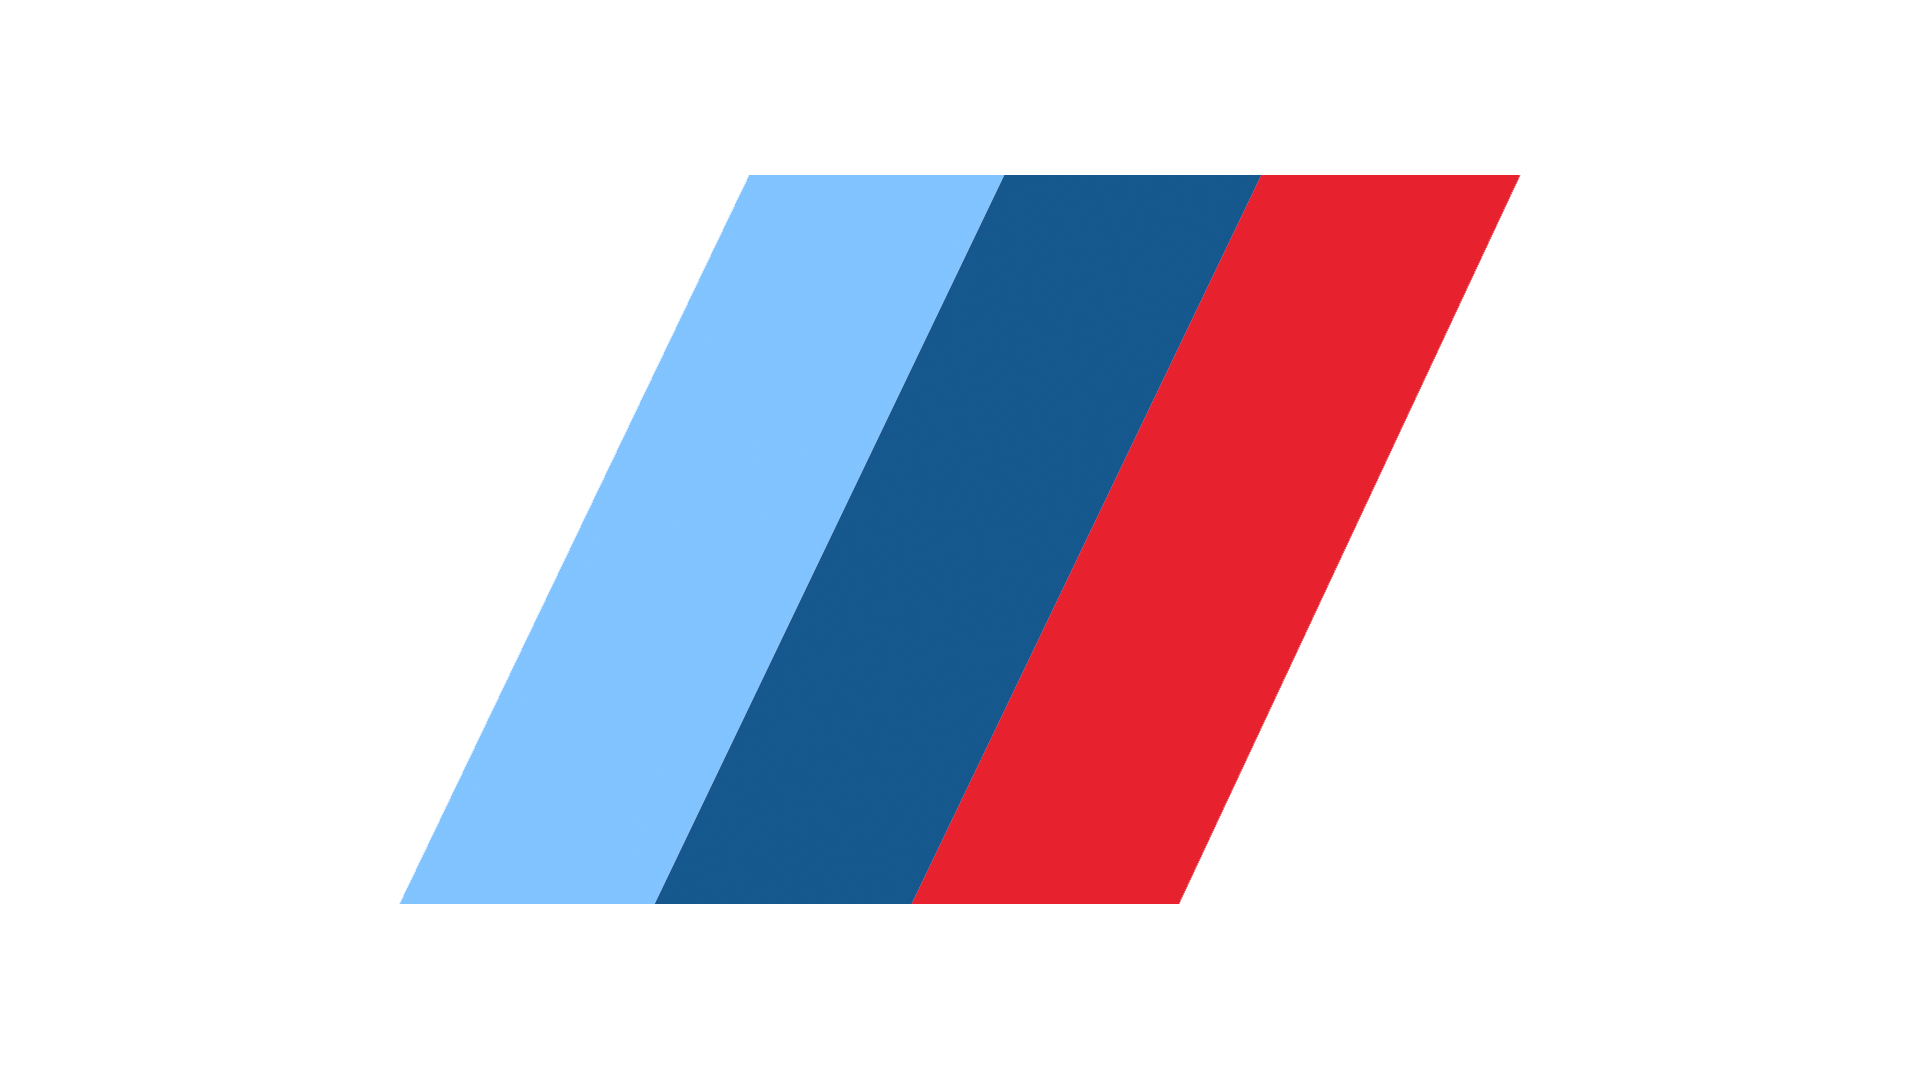 BMW-M-symbol-1920x1080png